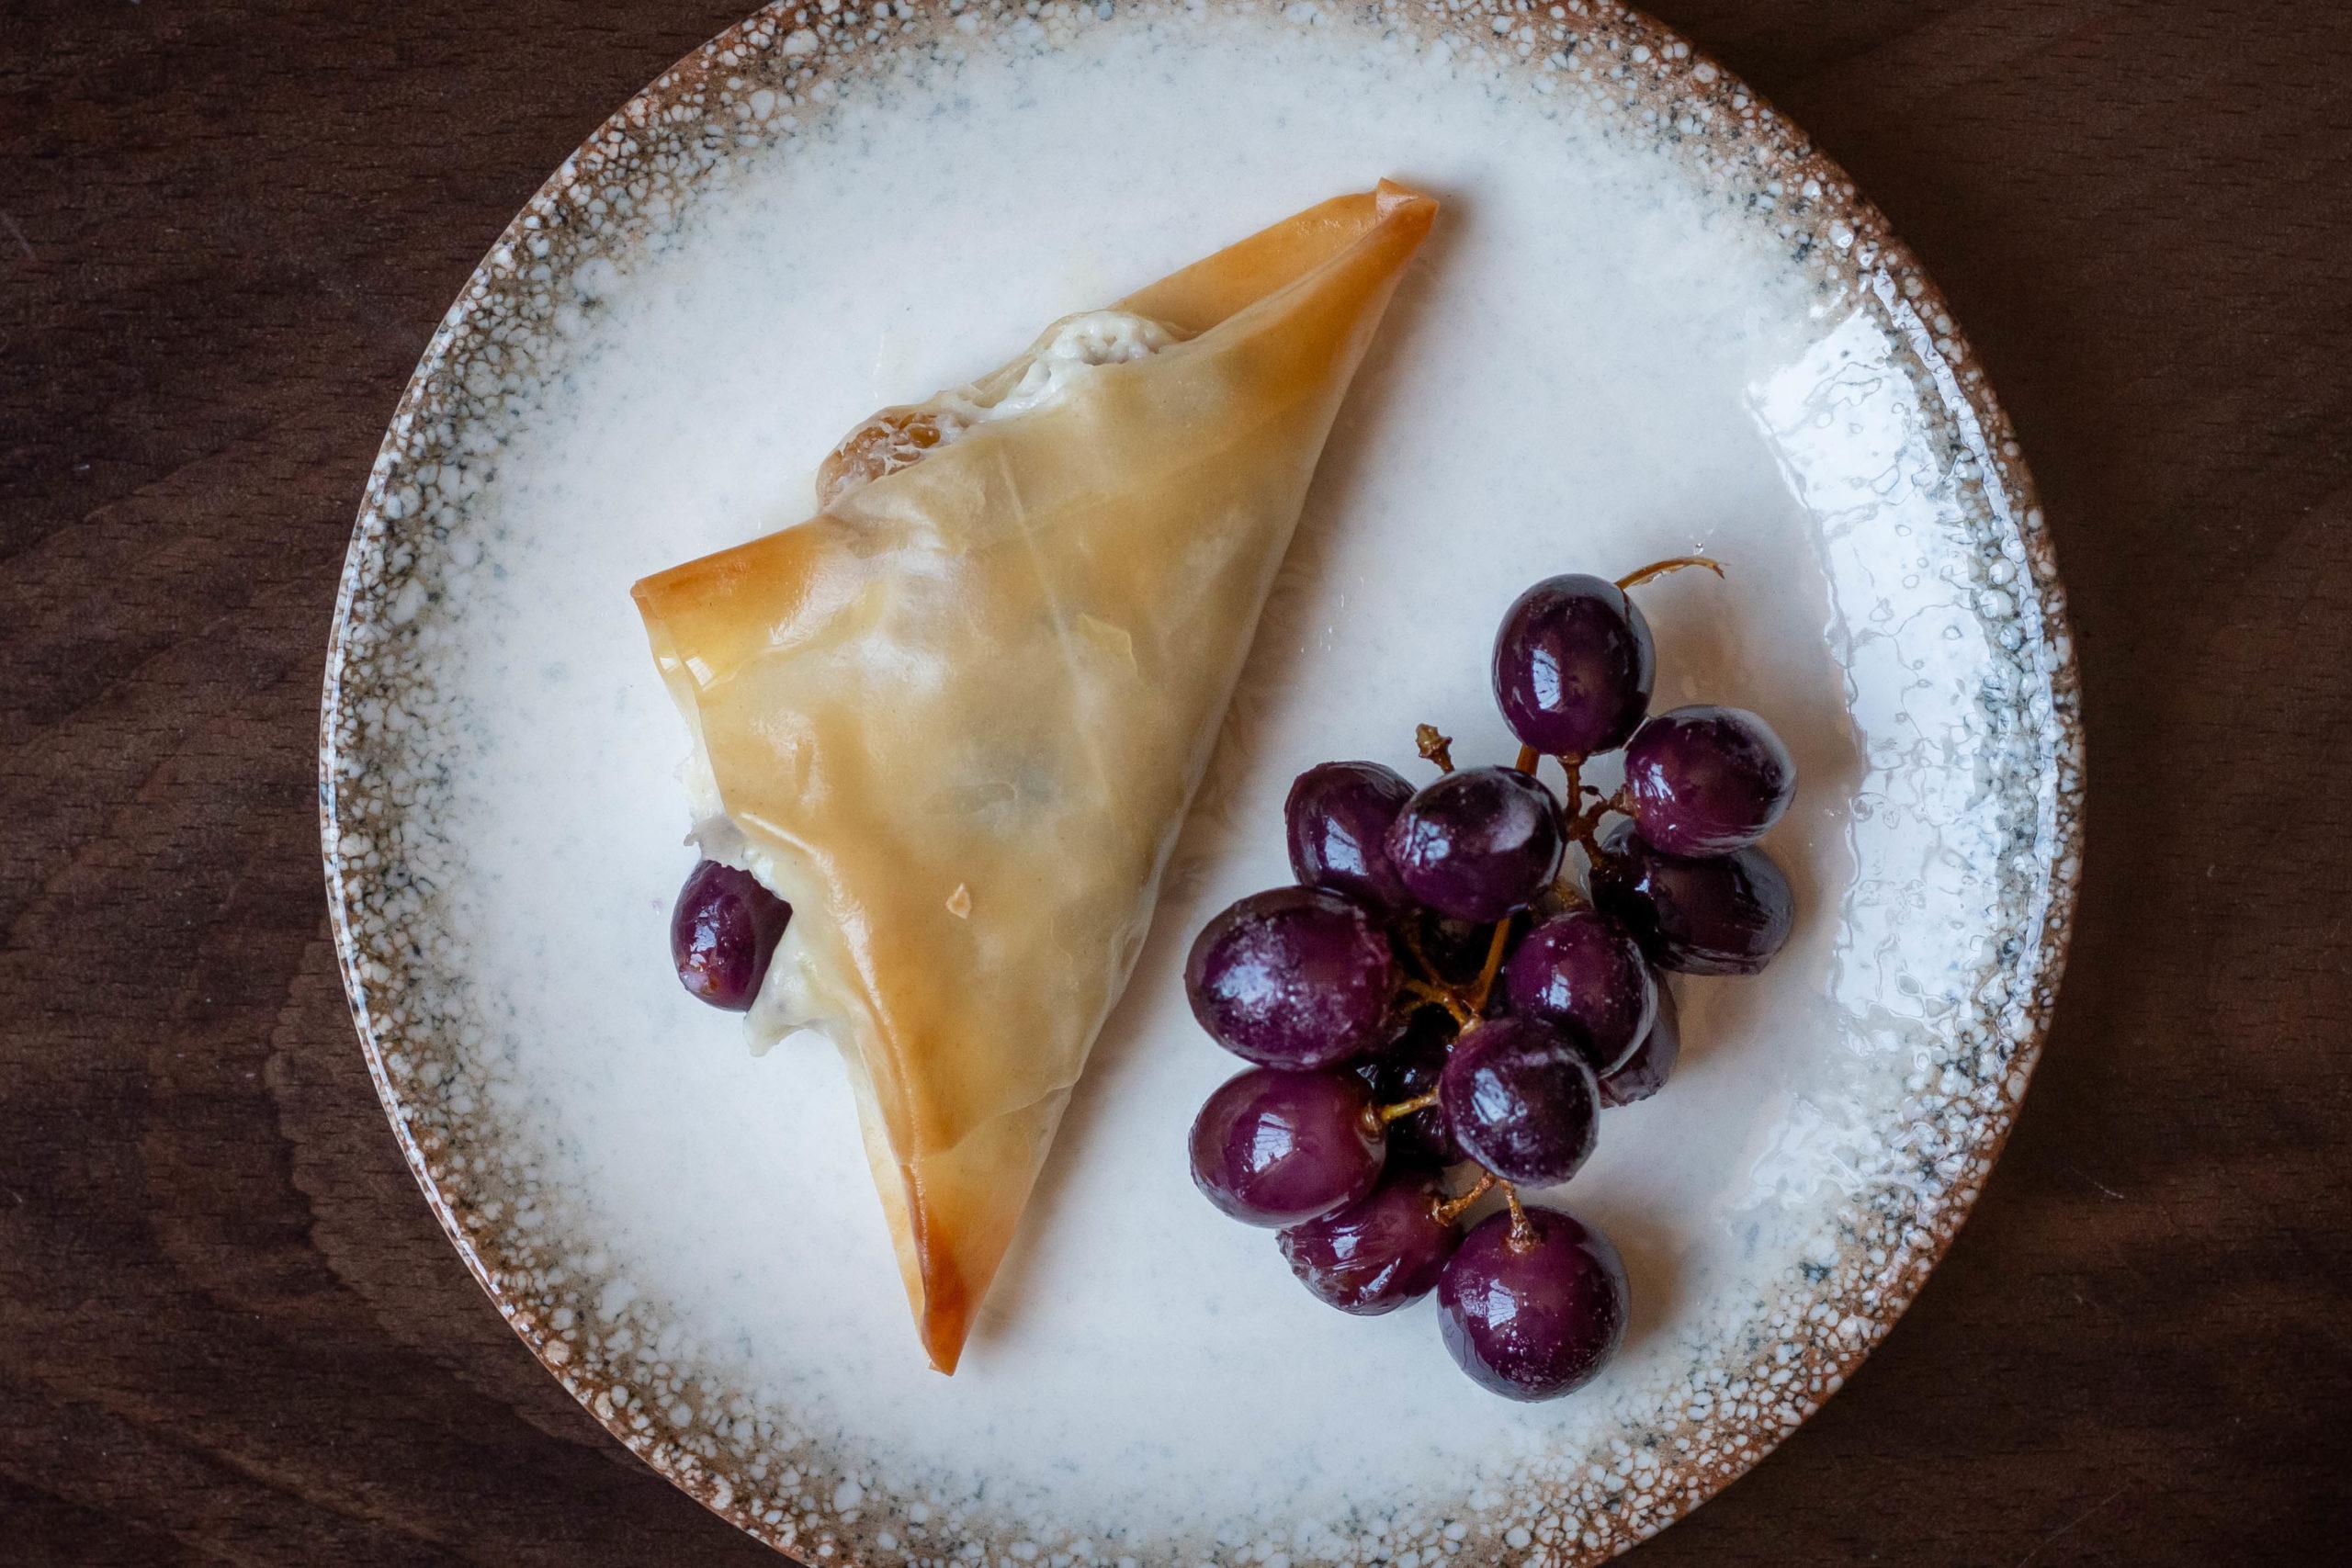 Filo triangles stuffed with kashta, grapes and raisins on white plate